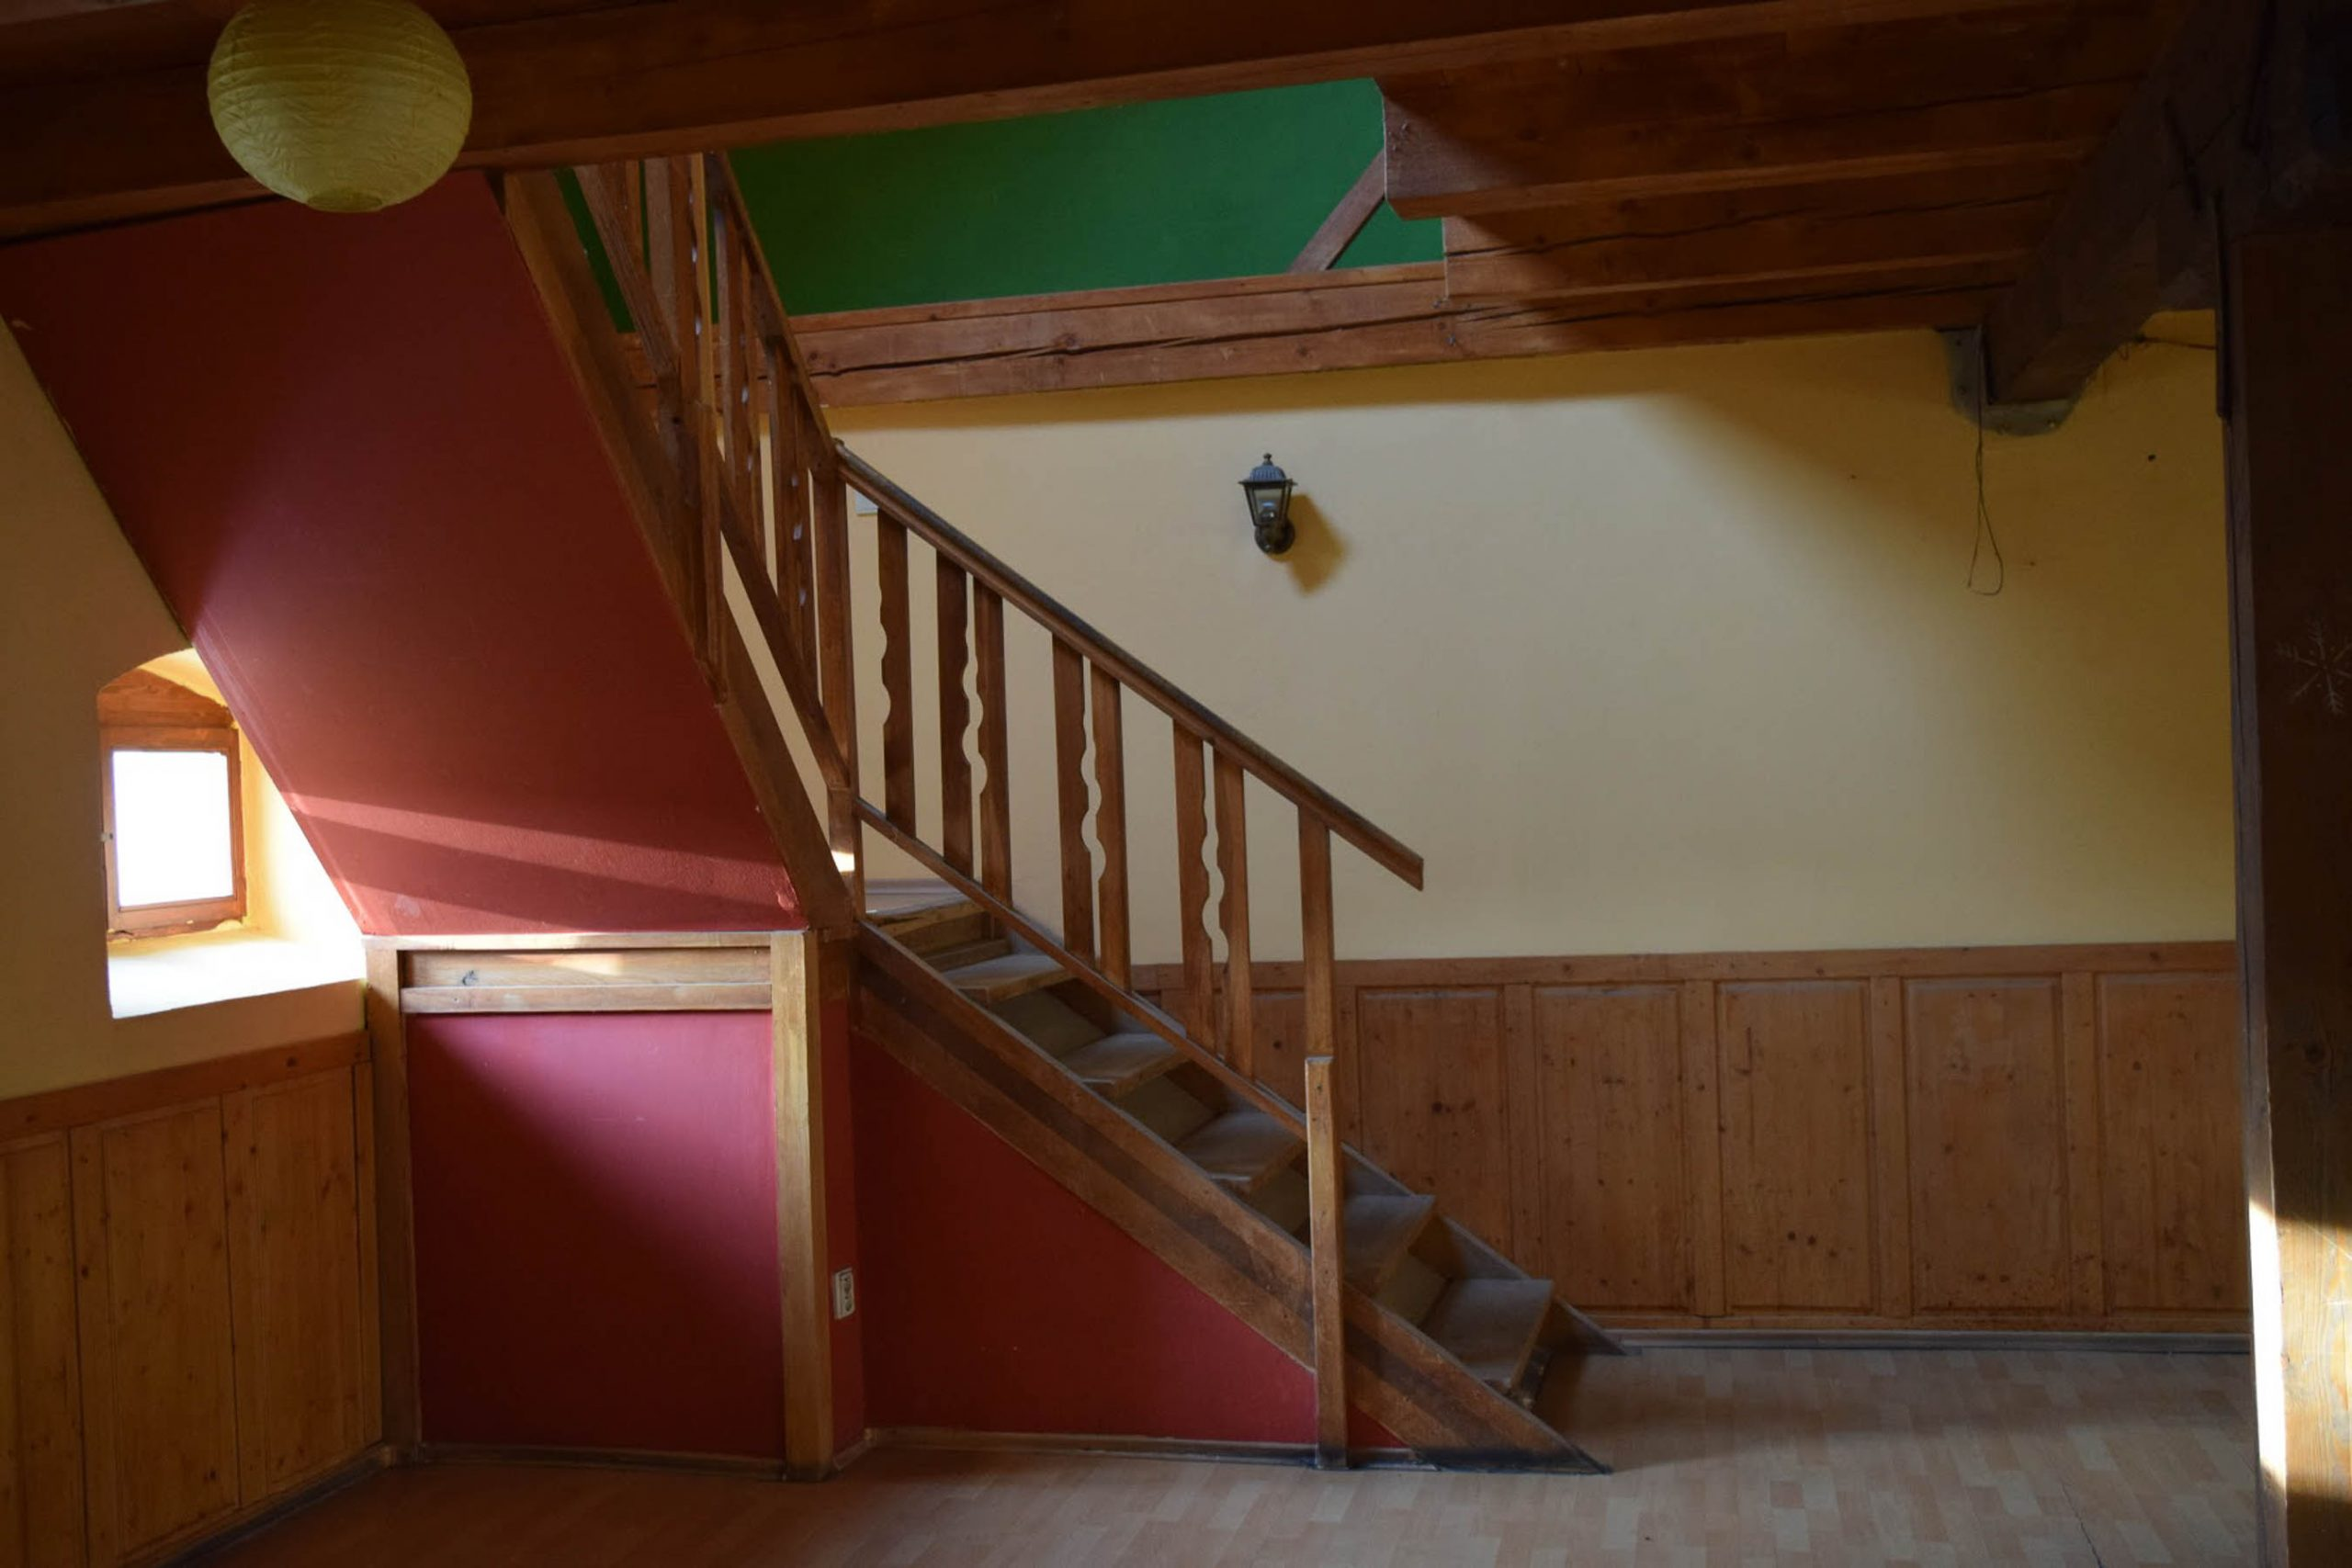 Rekonstrukcia a pristavba kaviarne, schodisko povodne, VAUarchitects